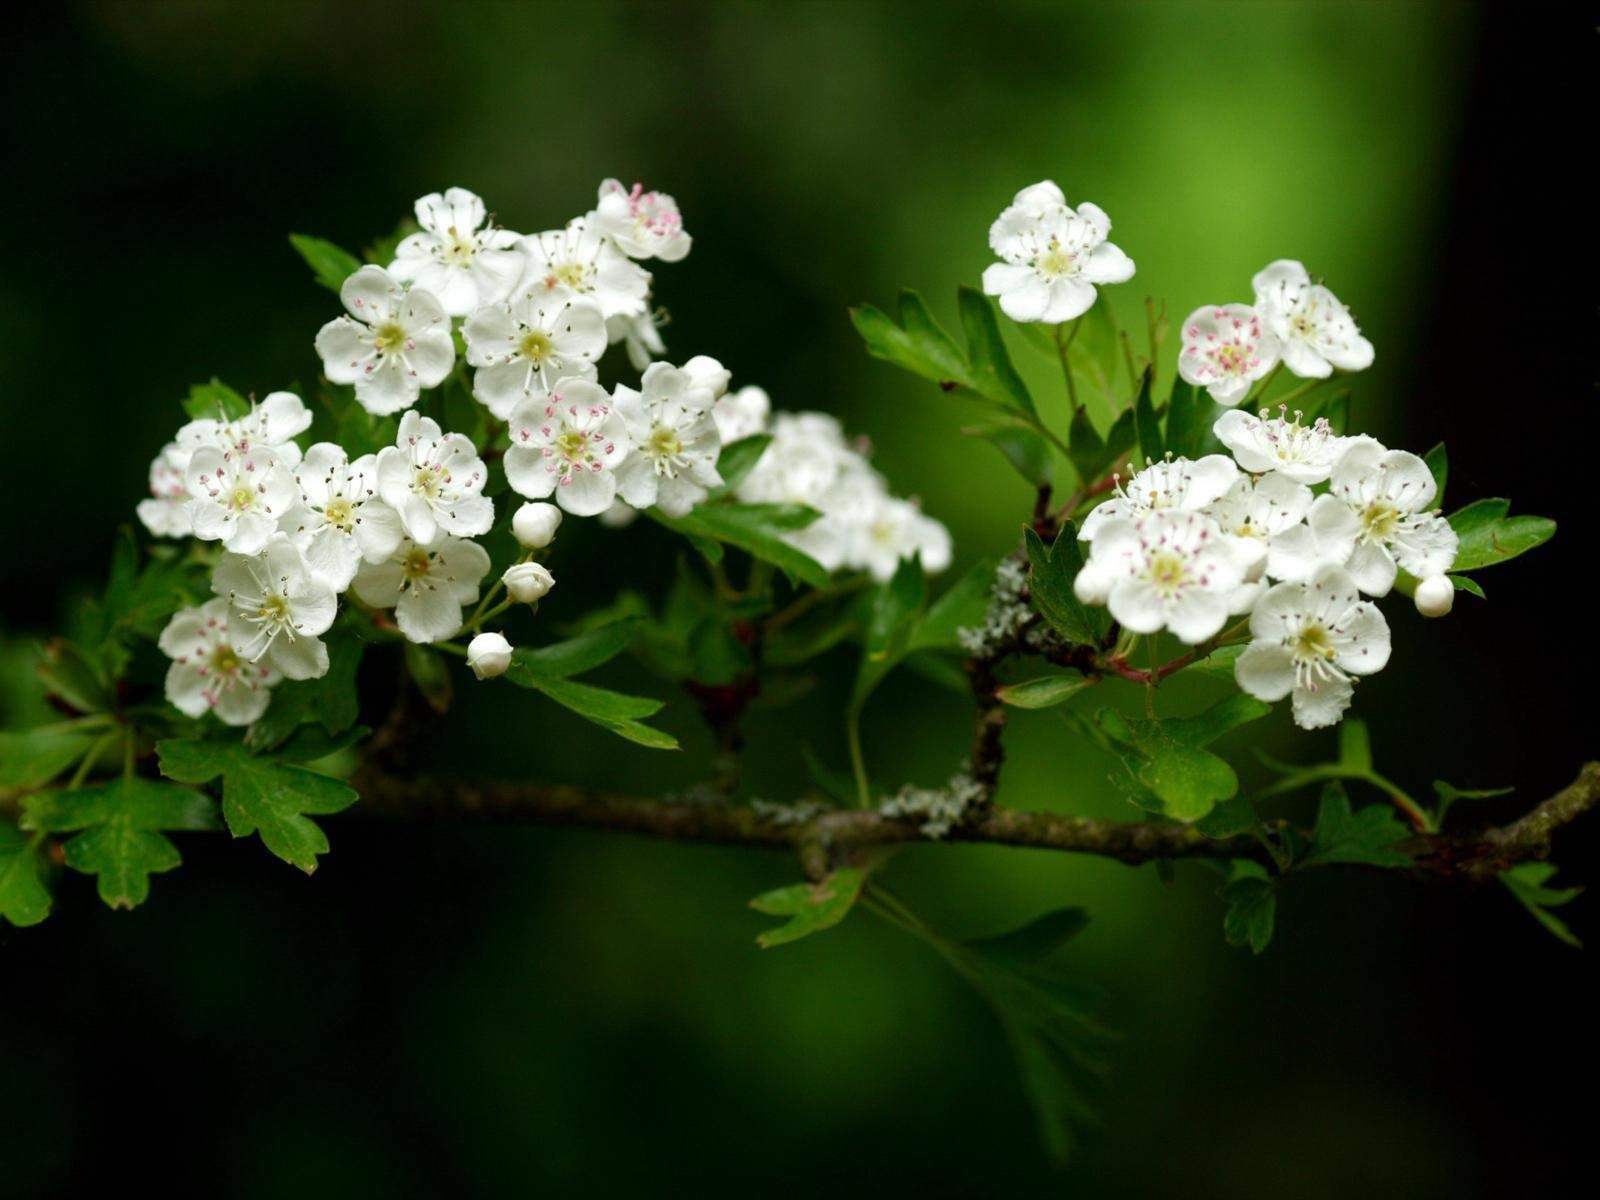 Amazing White Flower Wallpaper White Flowers Hd Wallpaper Hd